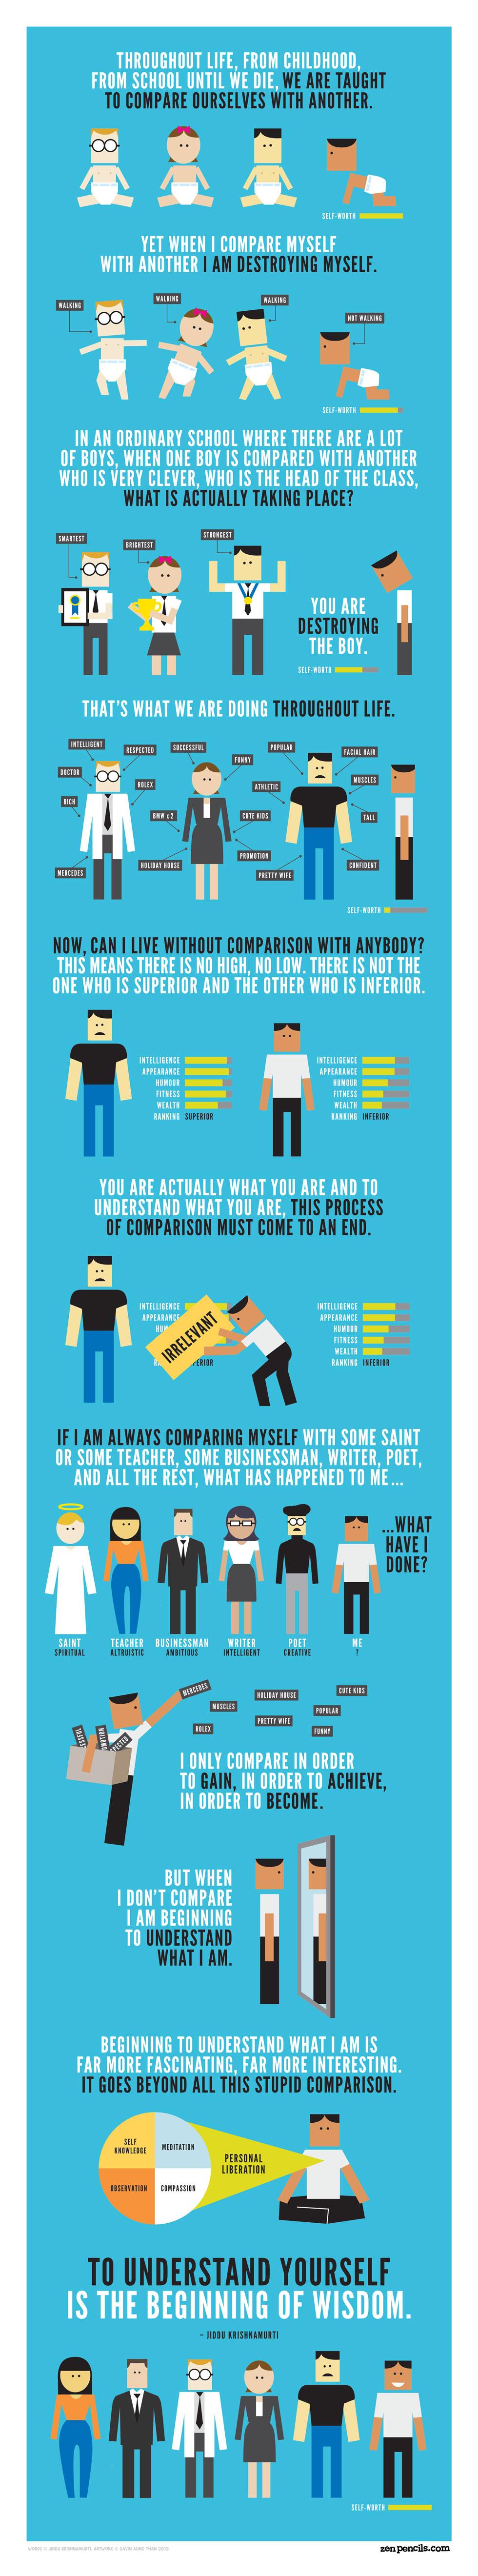 comparing-myself